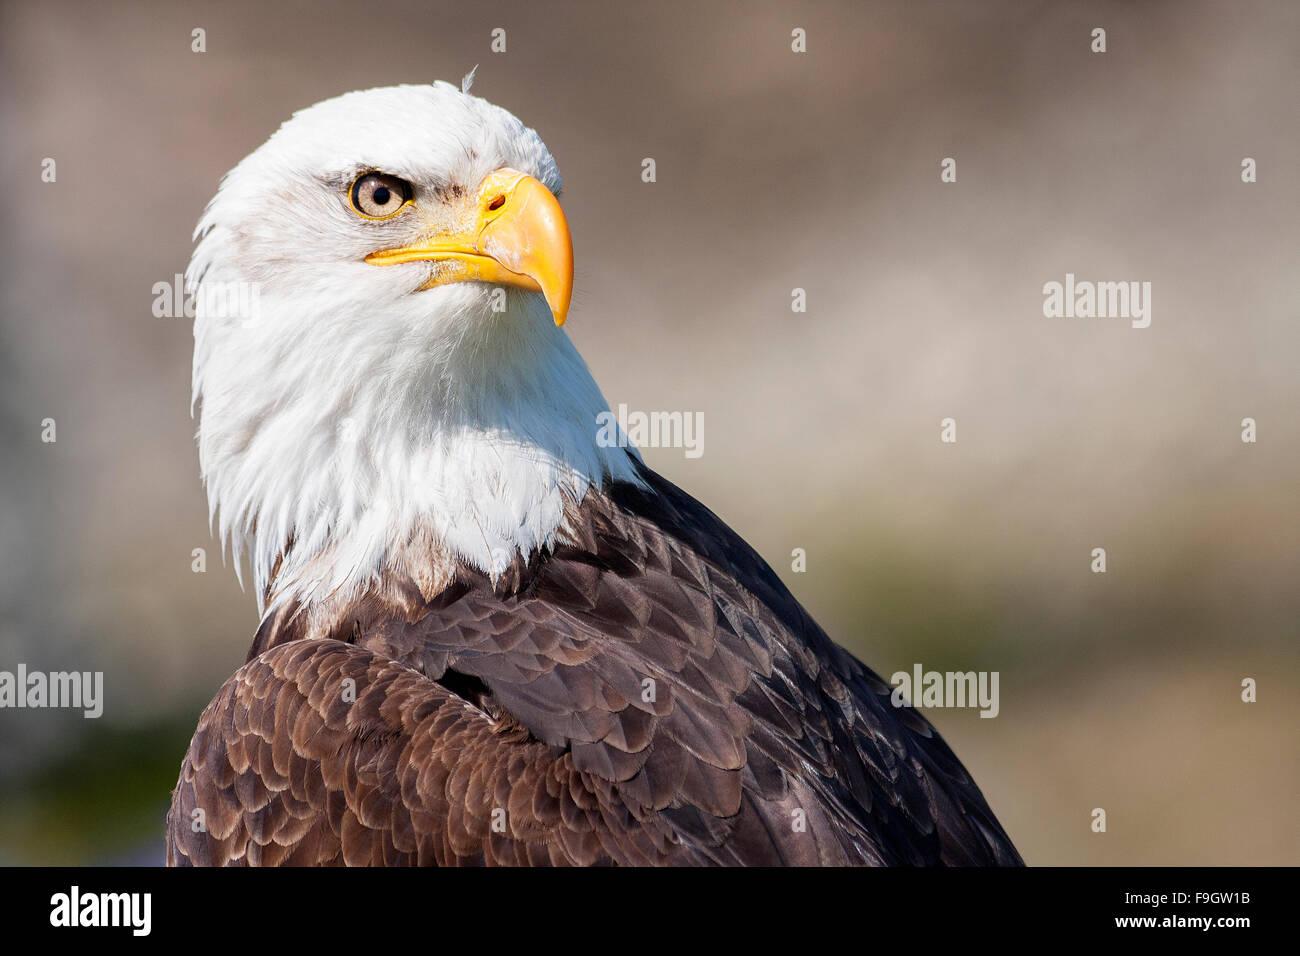 Retrato de un águila calva en Vancouver, Canadá Imagen De Stock